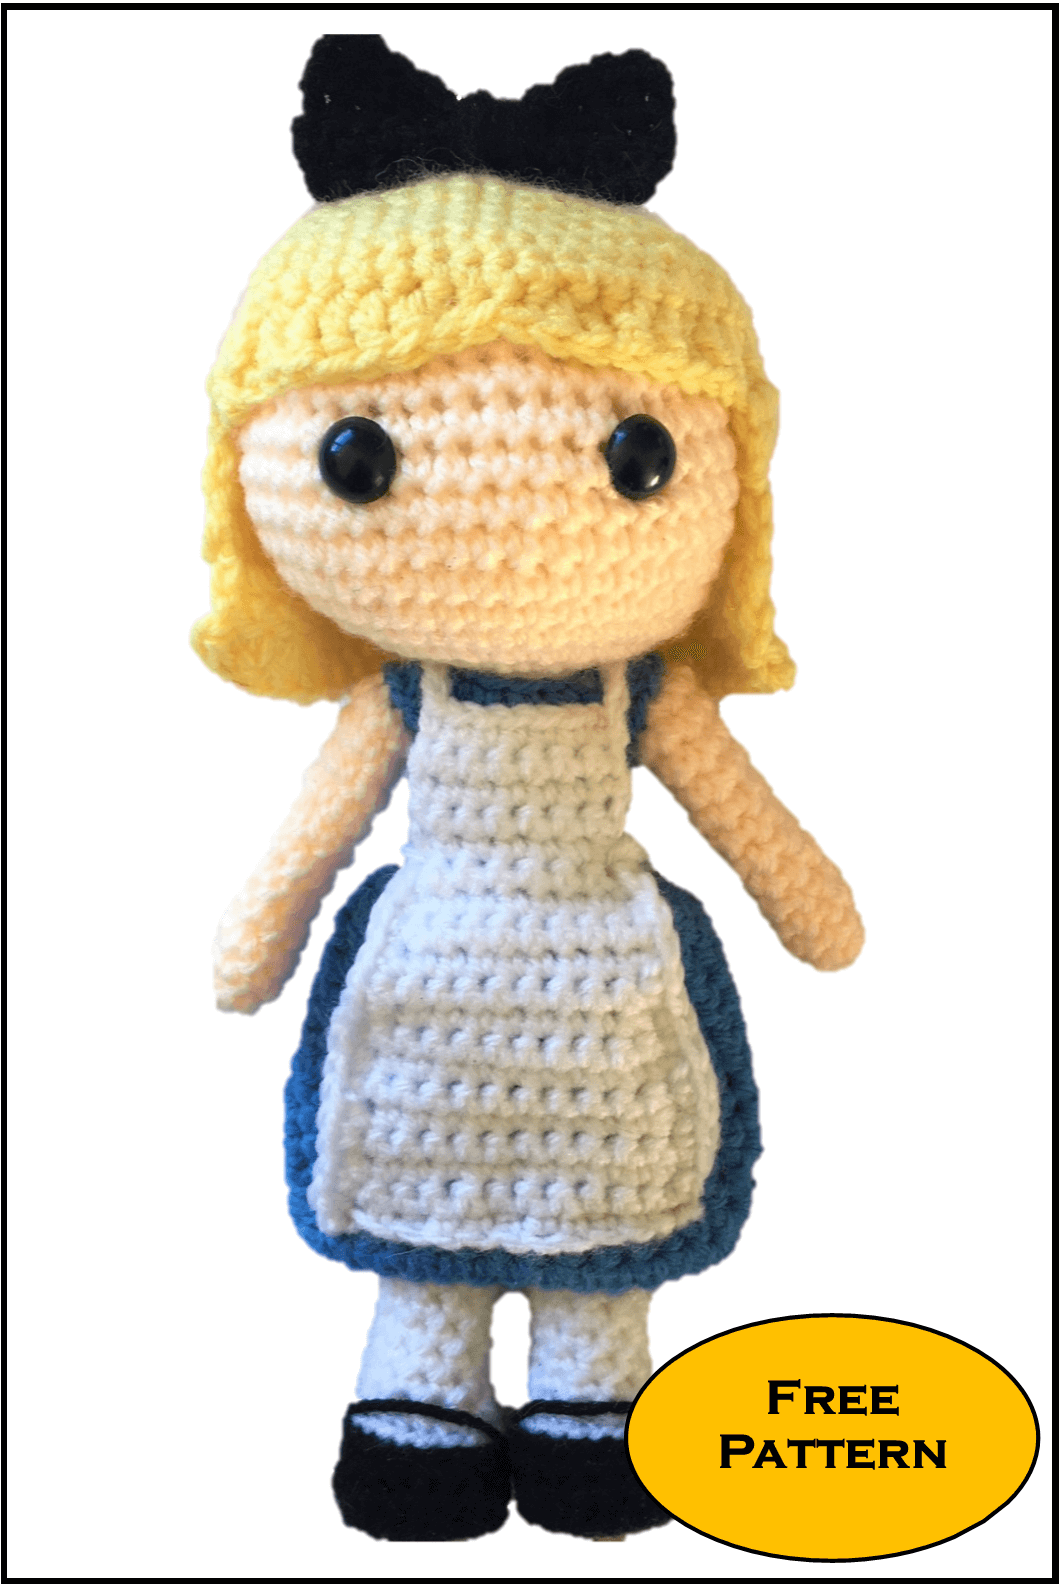 Free Snow White Amigurumi Pattern (Crochet) – EN – Free Amigurumi | 1585x1059